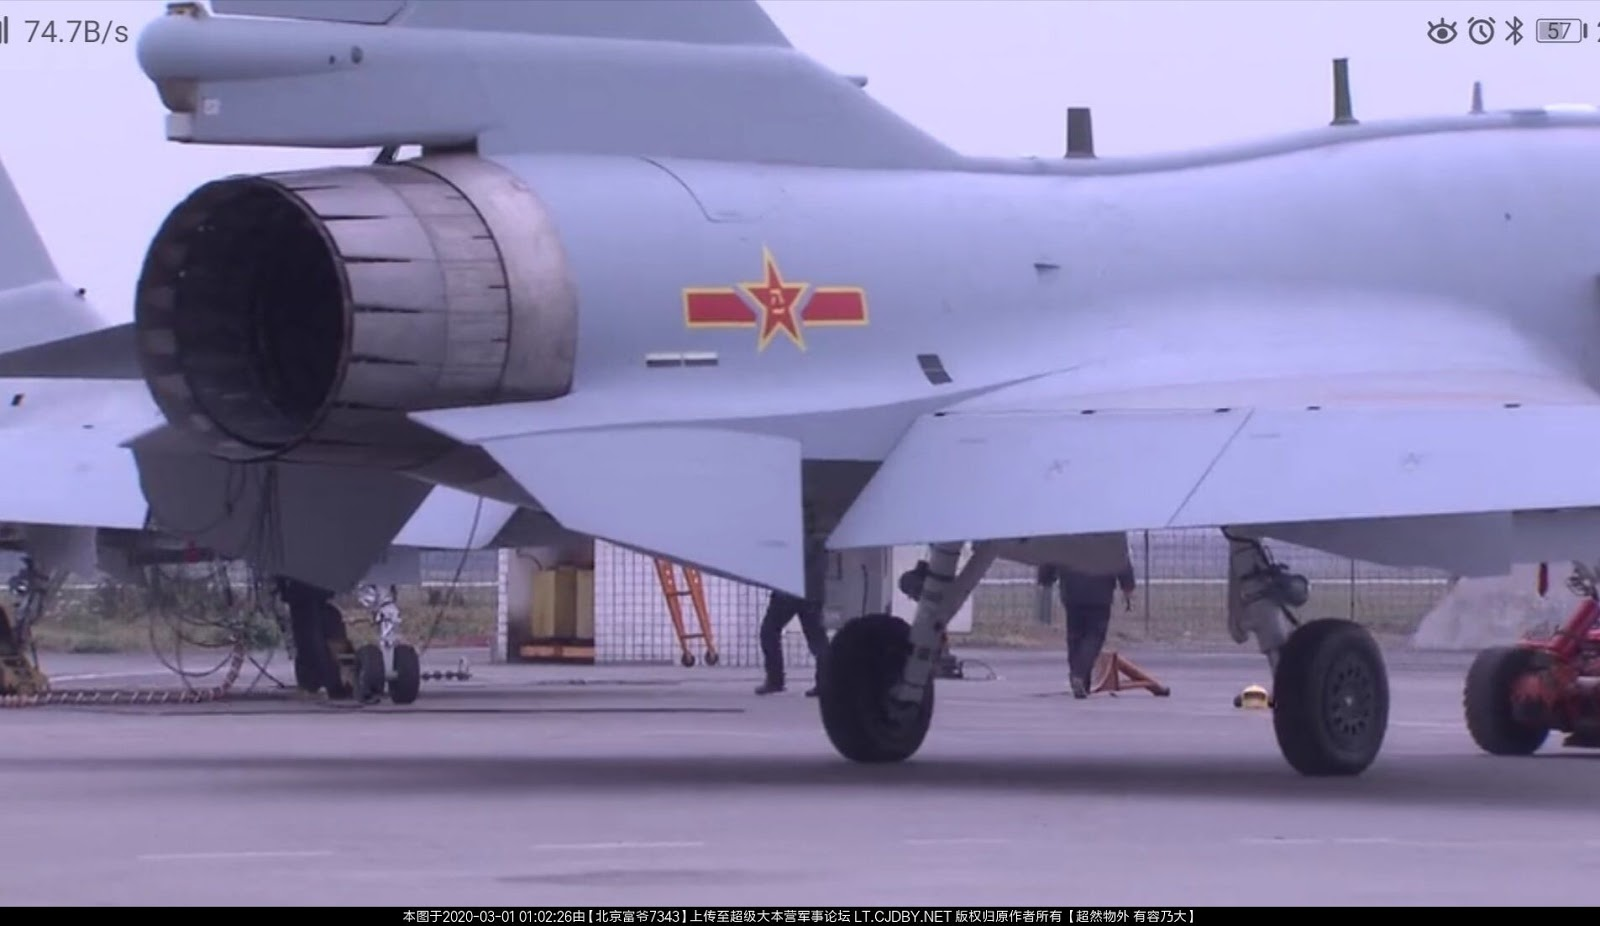 J-10Ctobedeliverdws10b.jpg